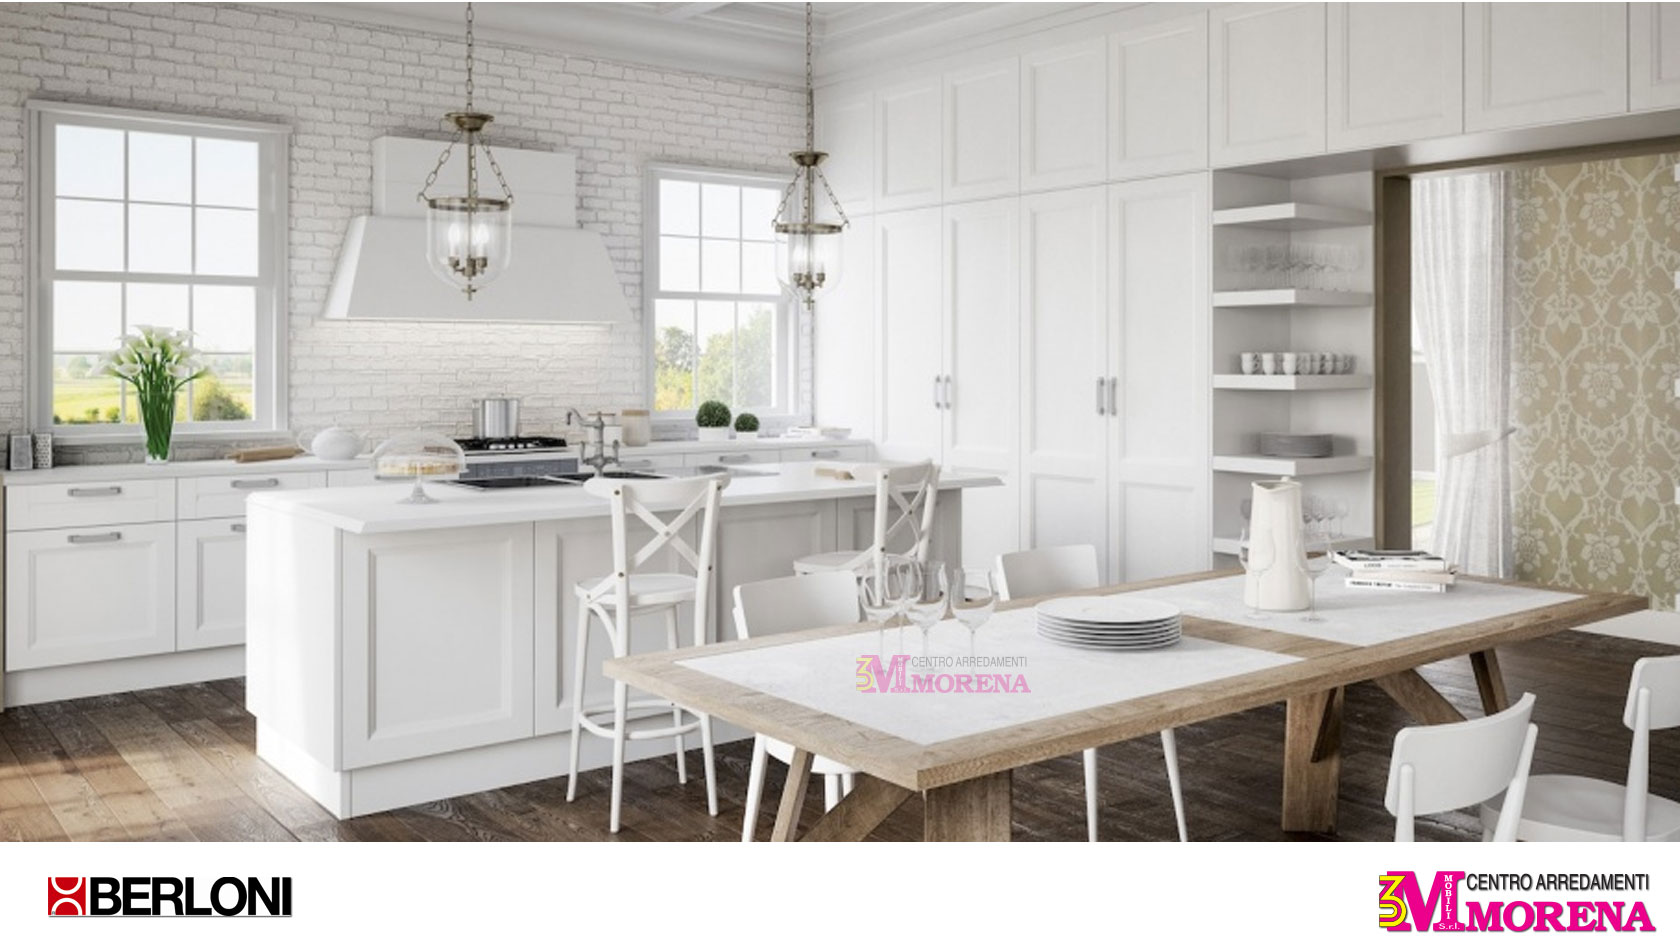 Cucina ginevra stosa design per la casa moderna - Cucina ginevra stosa ...